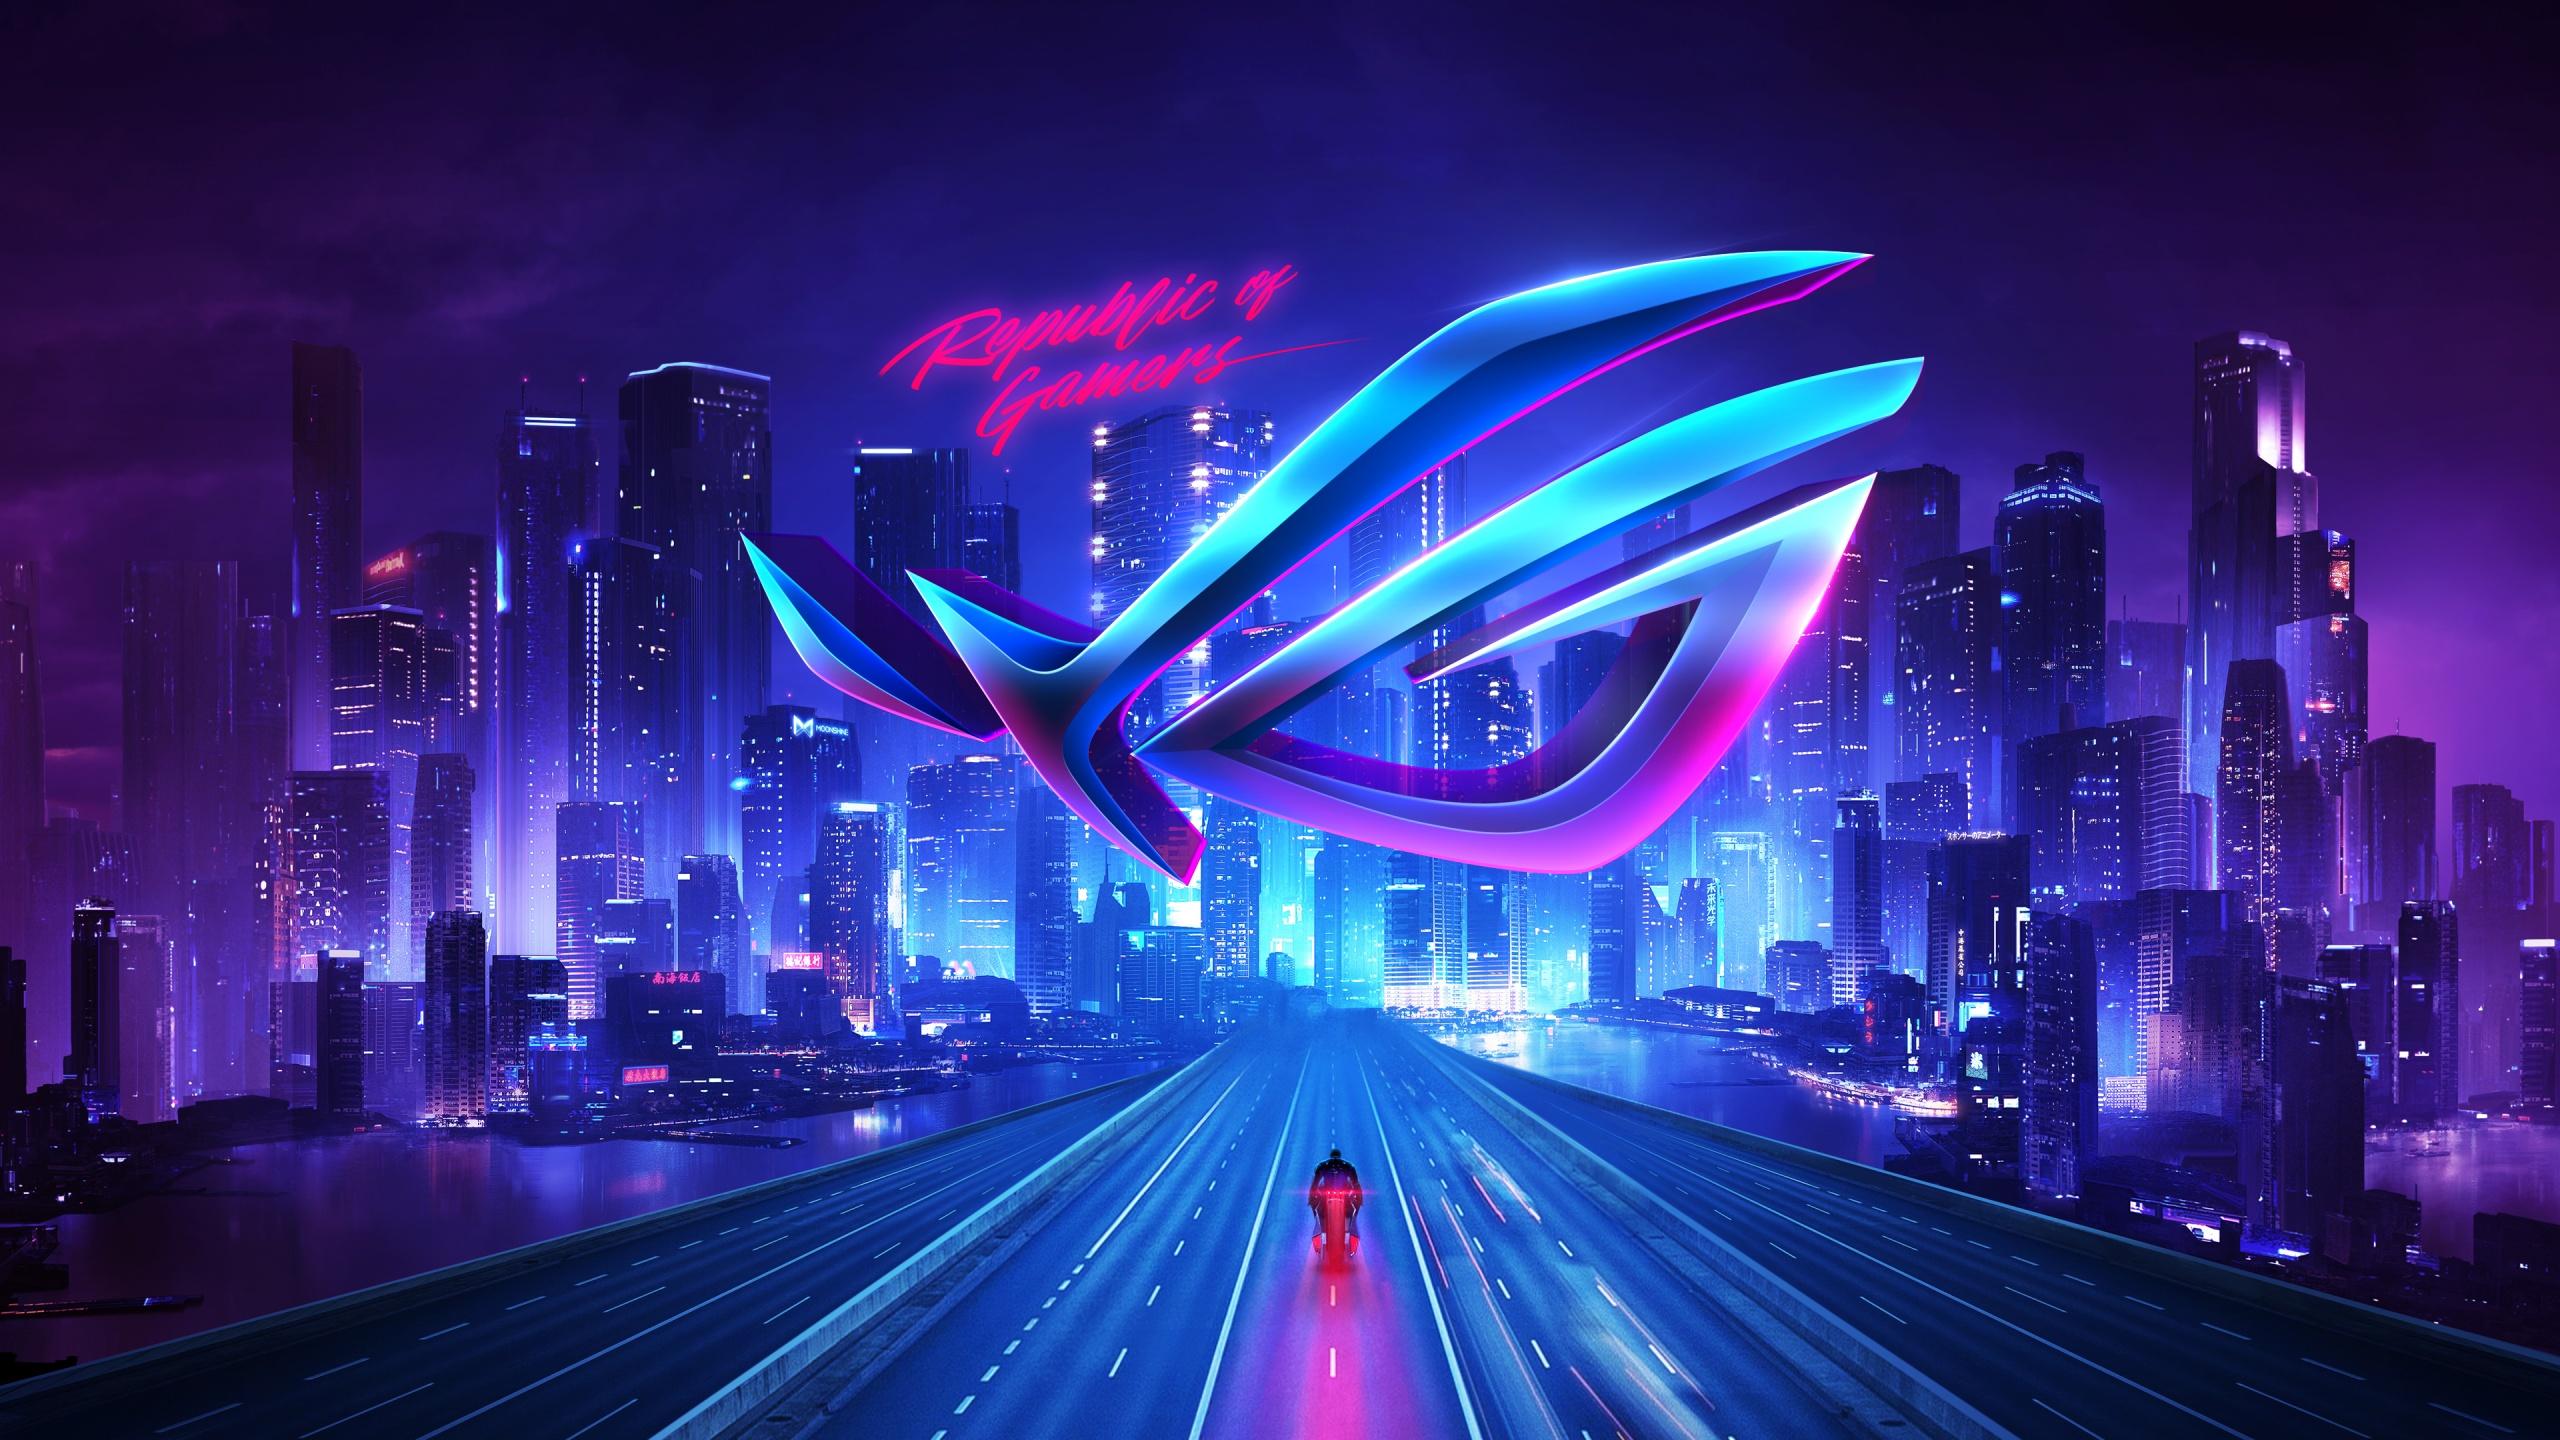 Republic of Gamers Wallpaper 4K ASUS ROG Cityscape Neon